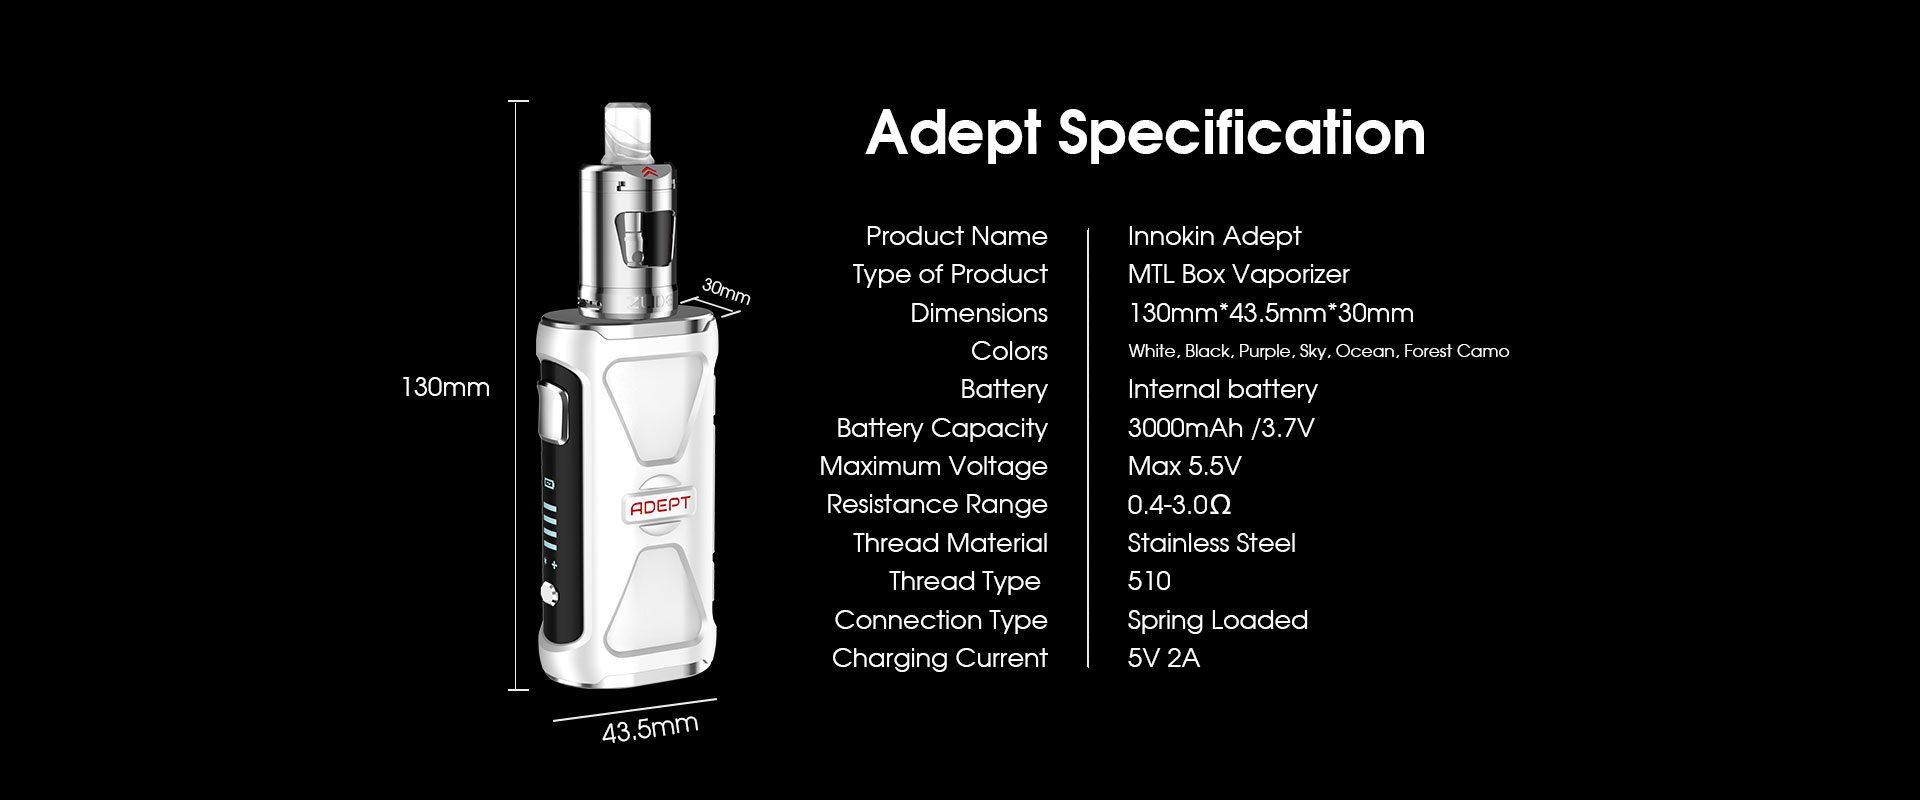 Adept Specifications